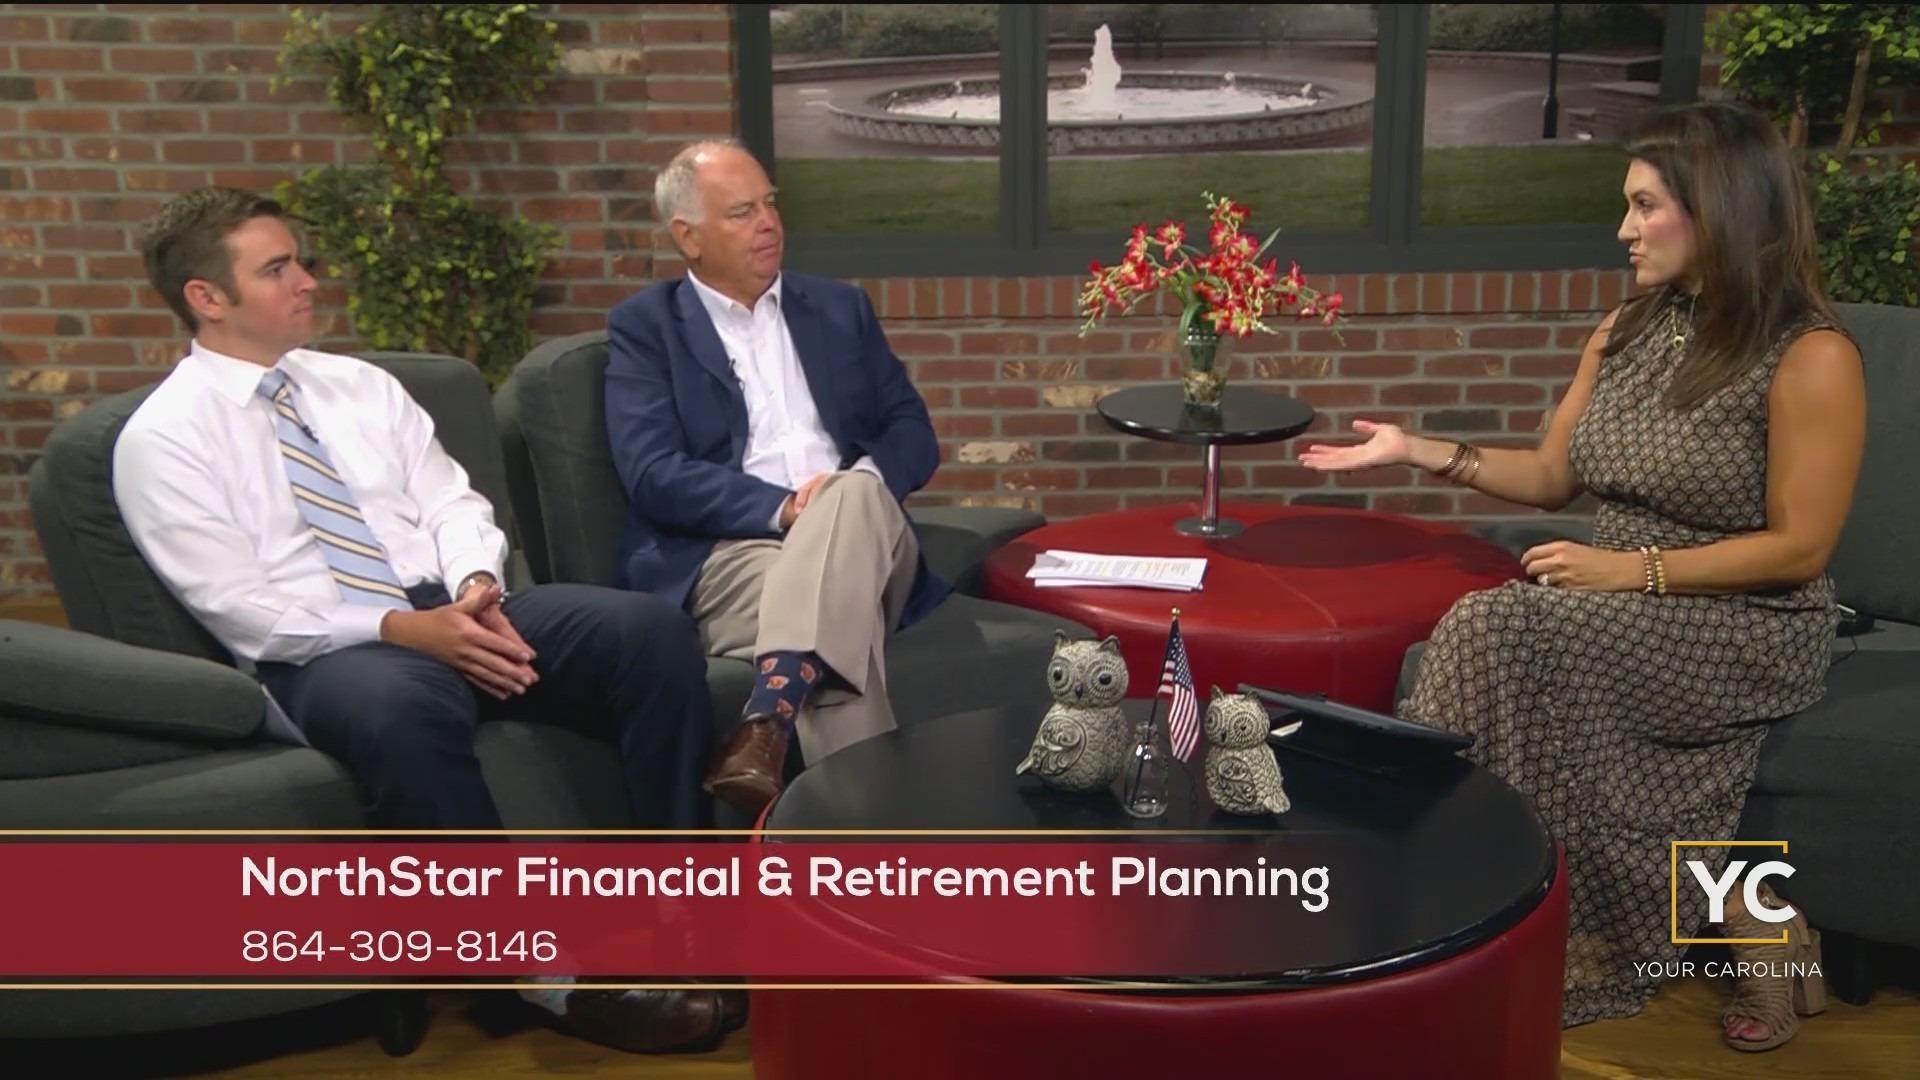 Retirement Coffee Talk - Preservation vs Accumulation